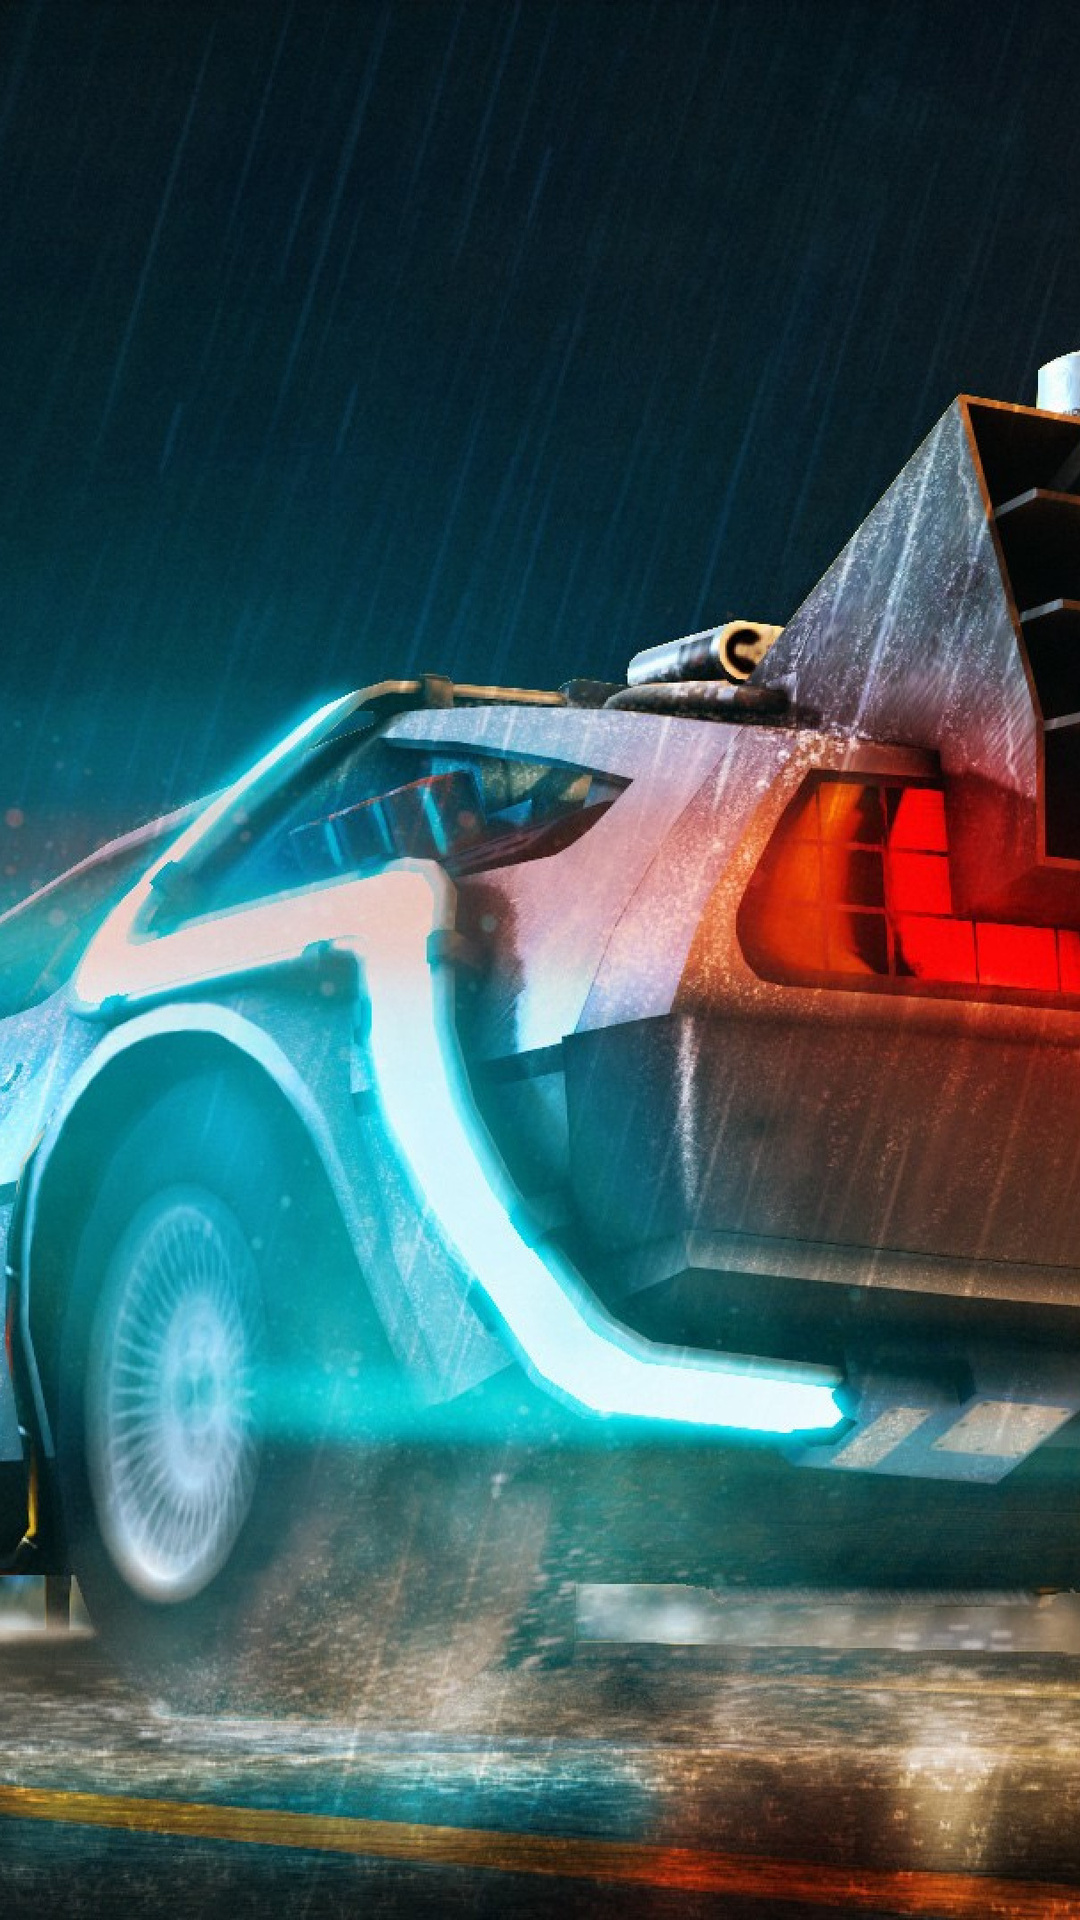 Ferrari 365 gts daytona 4k. Back To The Future Car Wallpaper Design Corral